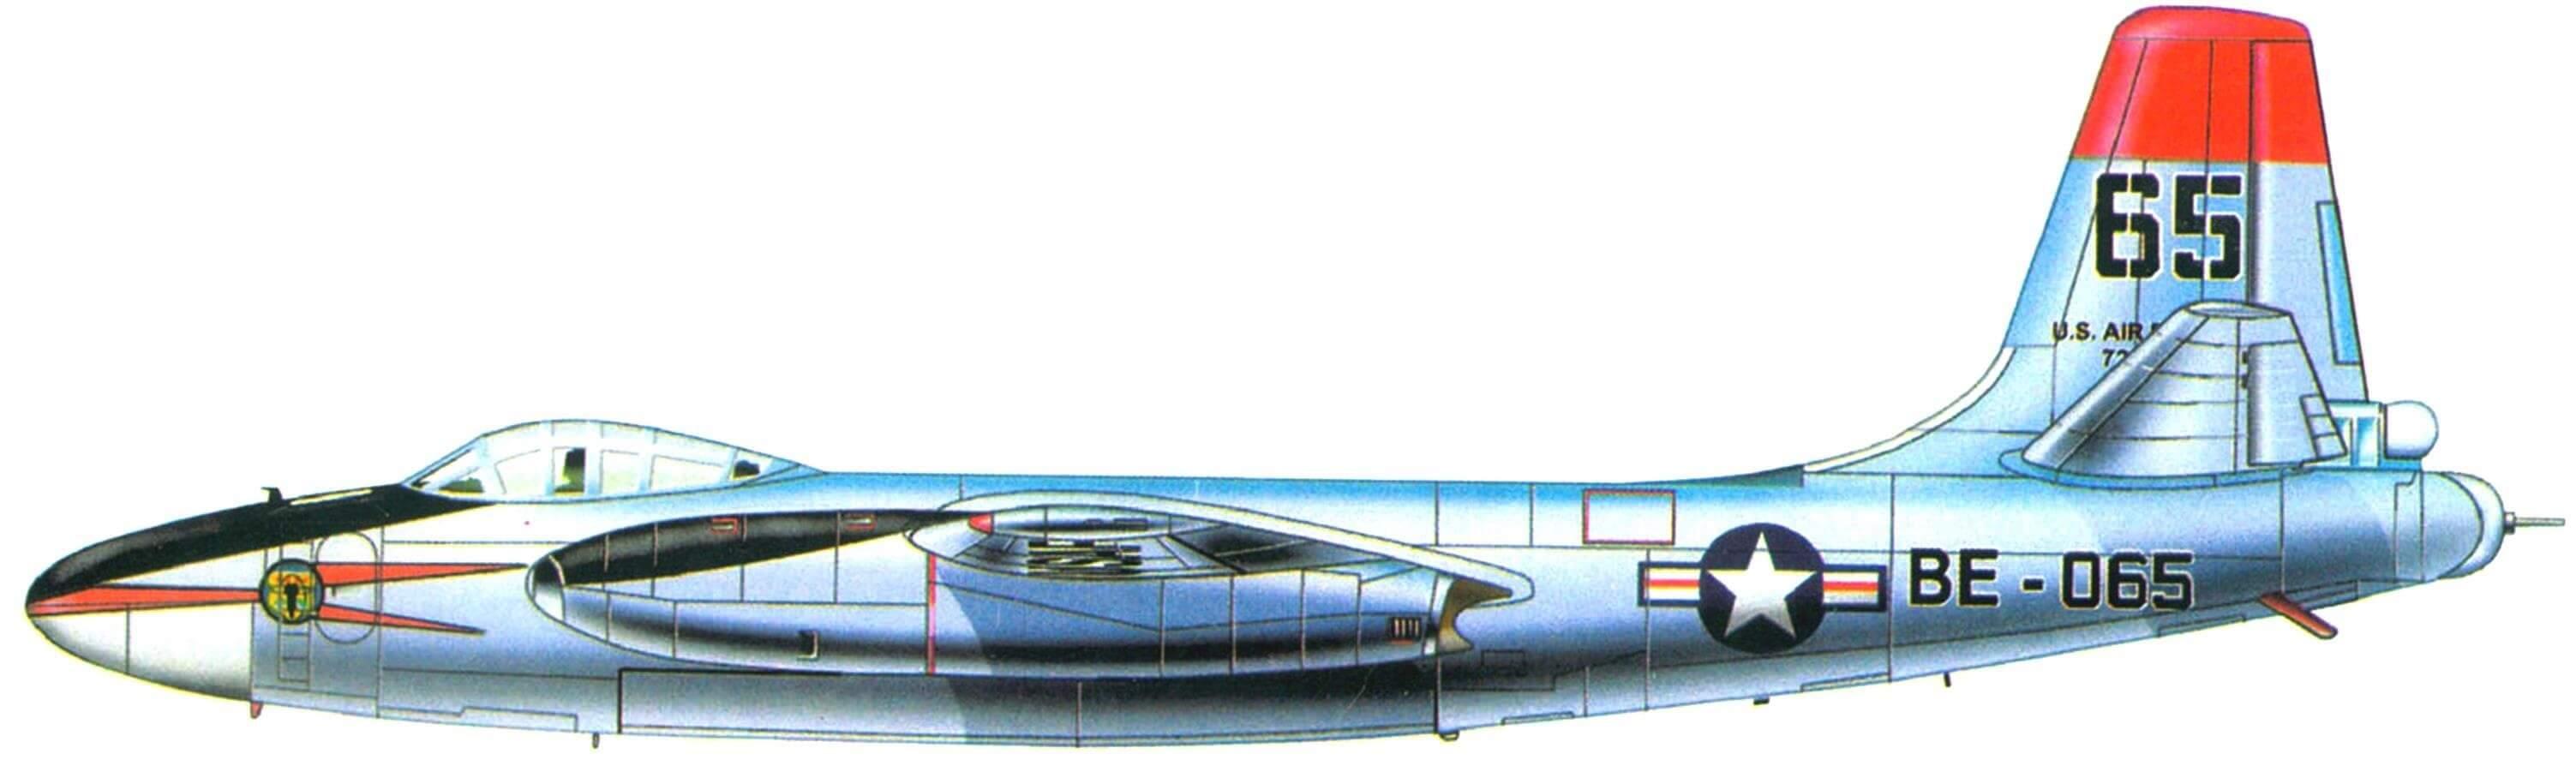 North American B-45 Tornado В-45А-5 из 84-й эскадрильи